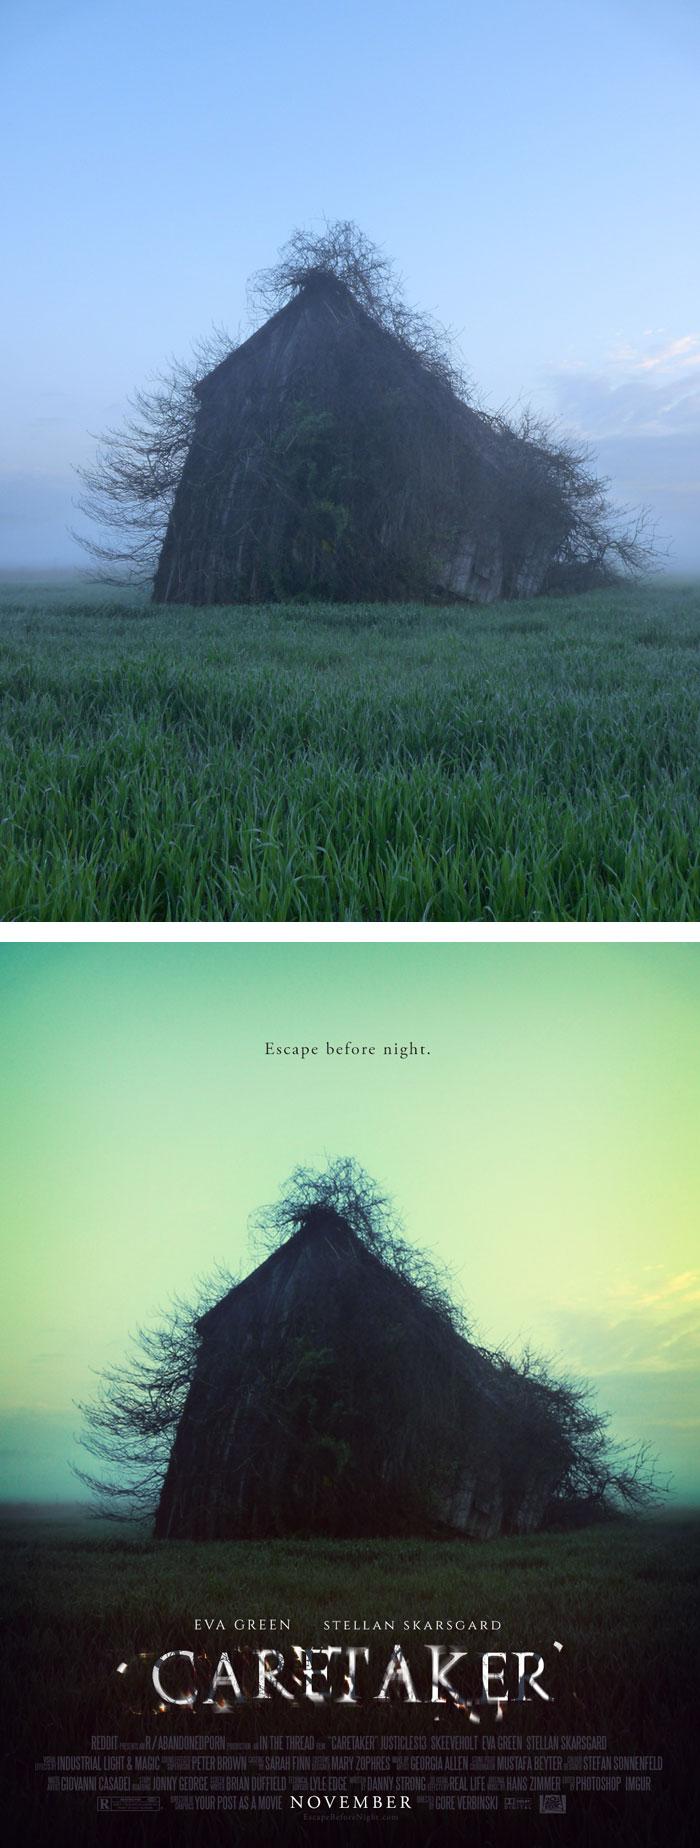 random-photos-turned-into-movie-posters-135__700